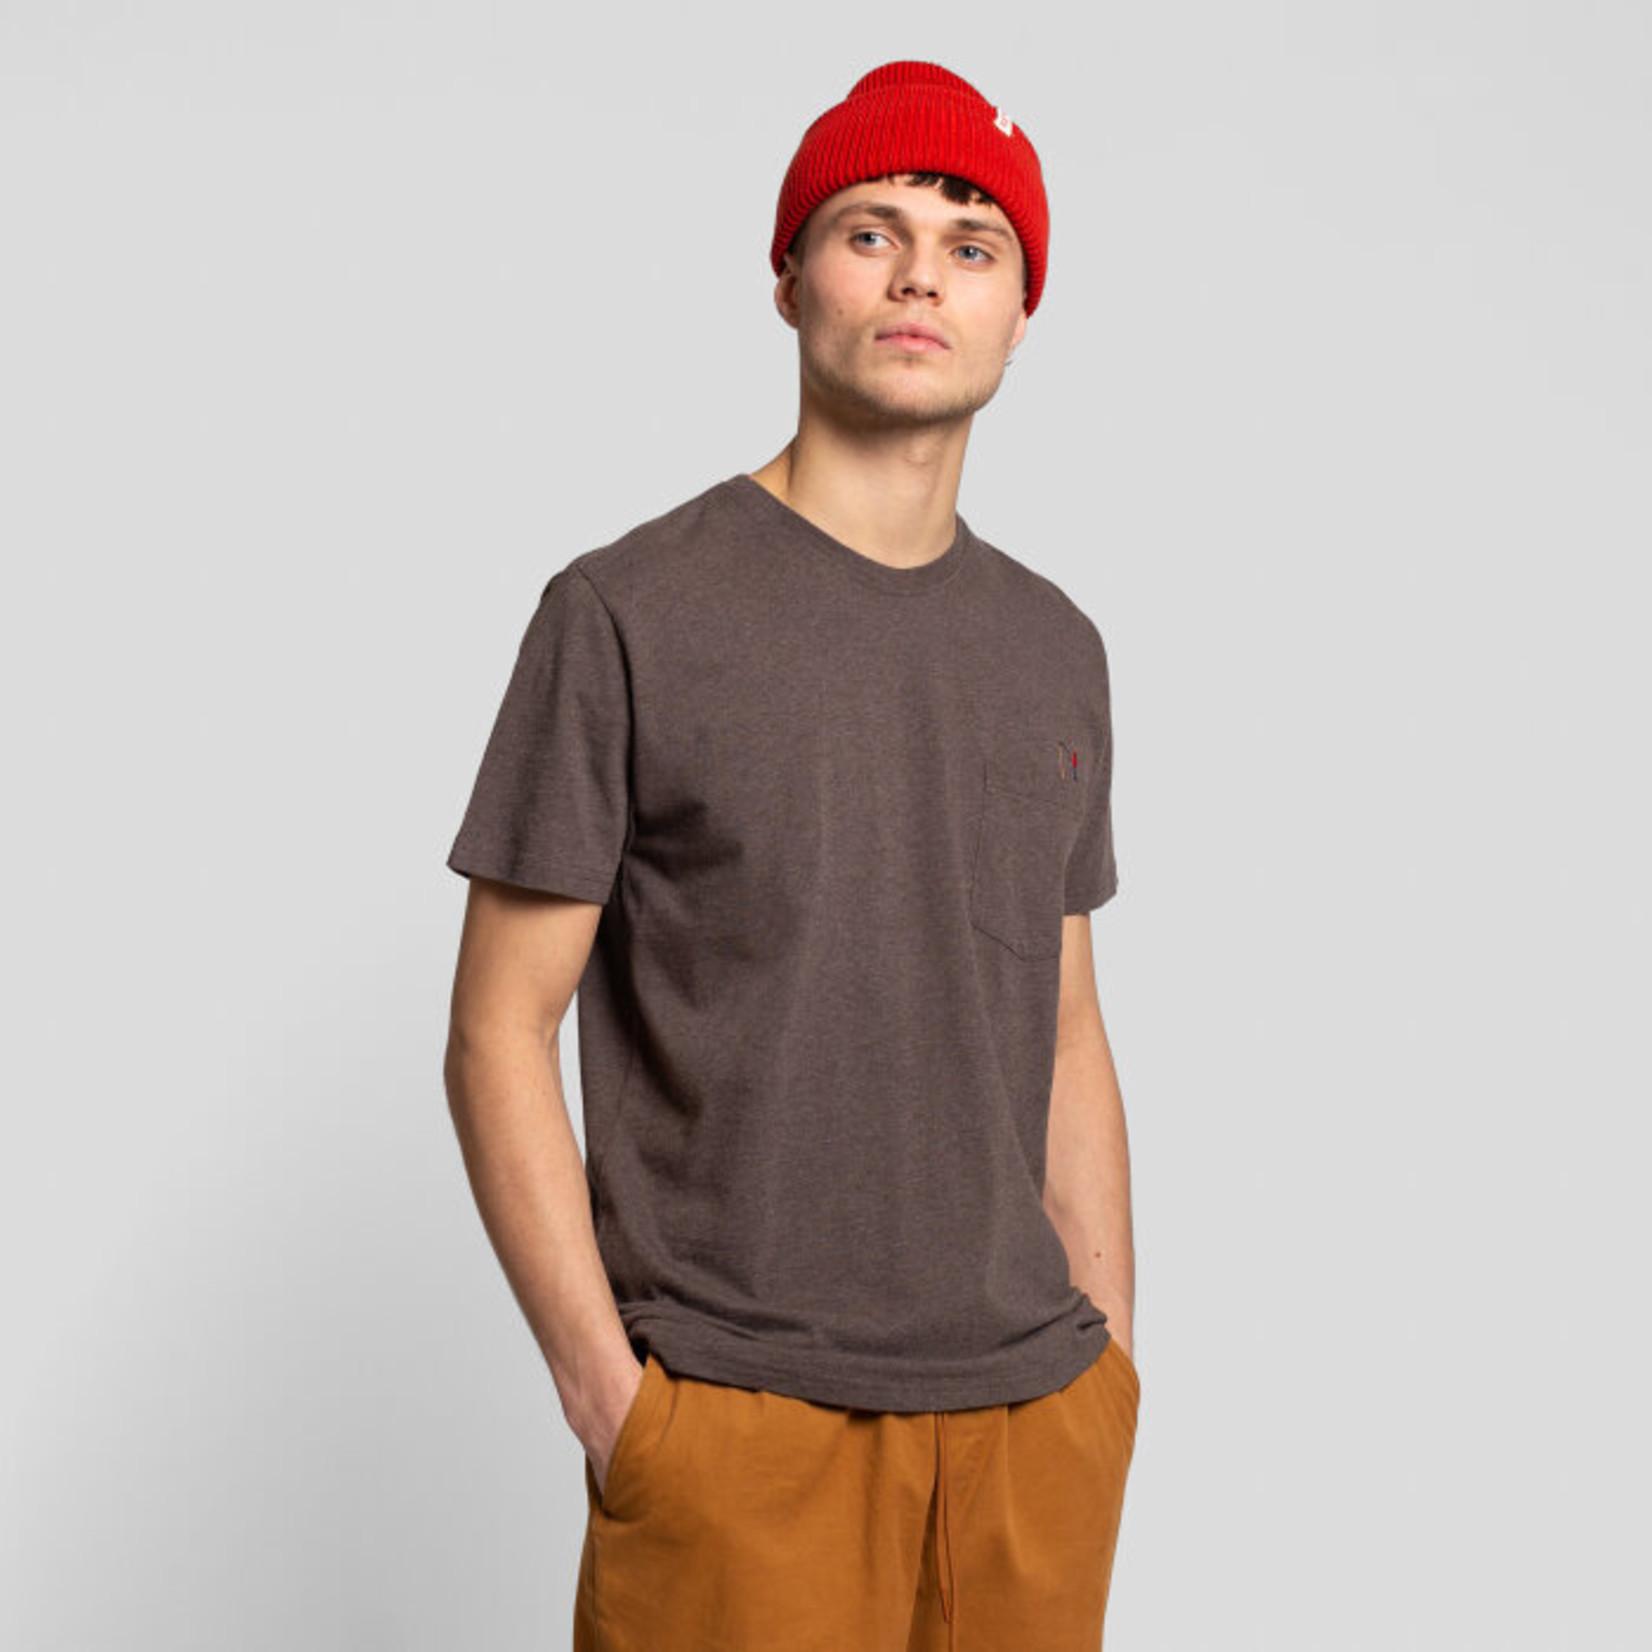 RVLT Revolution Revolution 1233 FIS T-Shirt